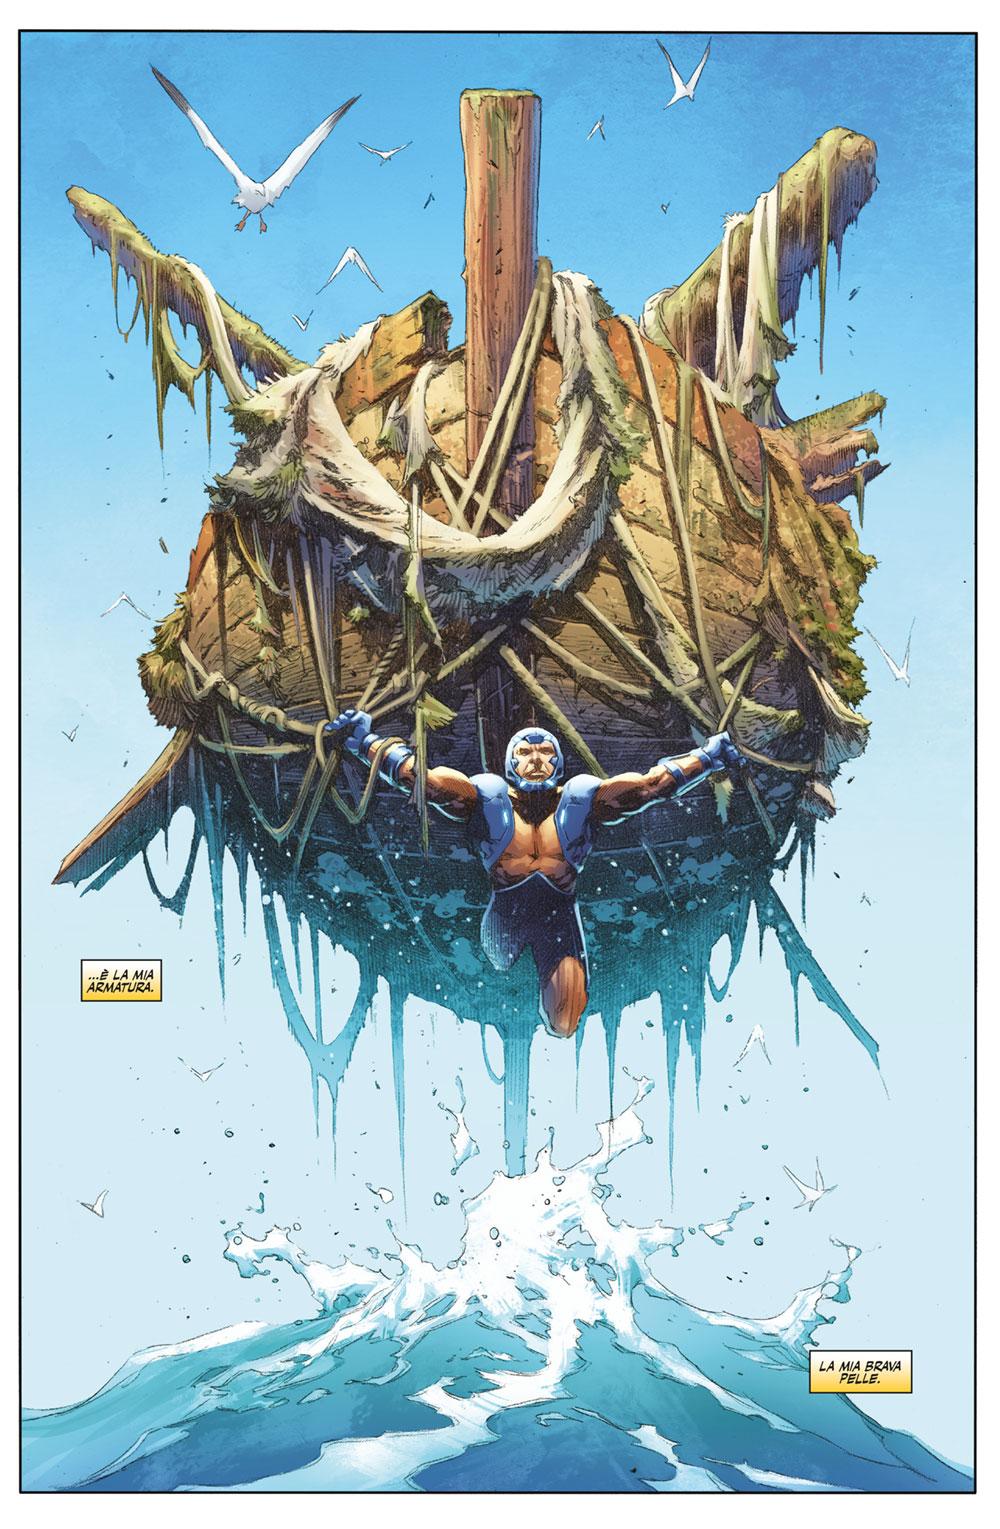 X-O Manowar vol. 7: Eroe, anteprima 04